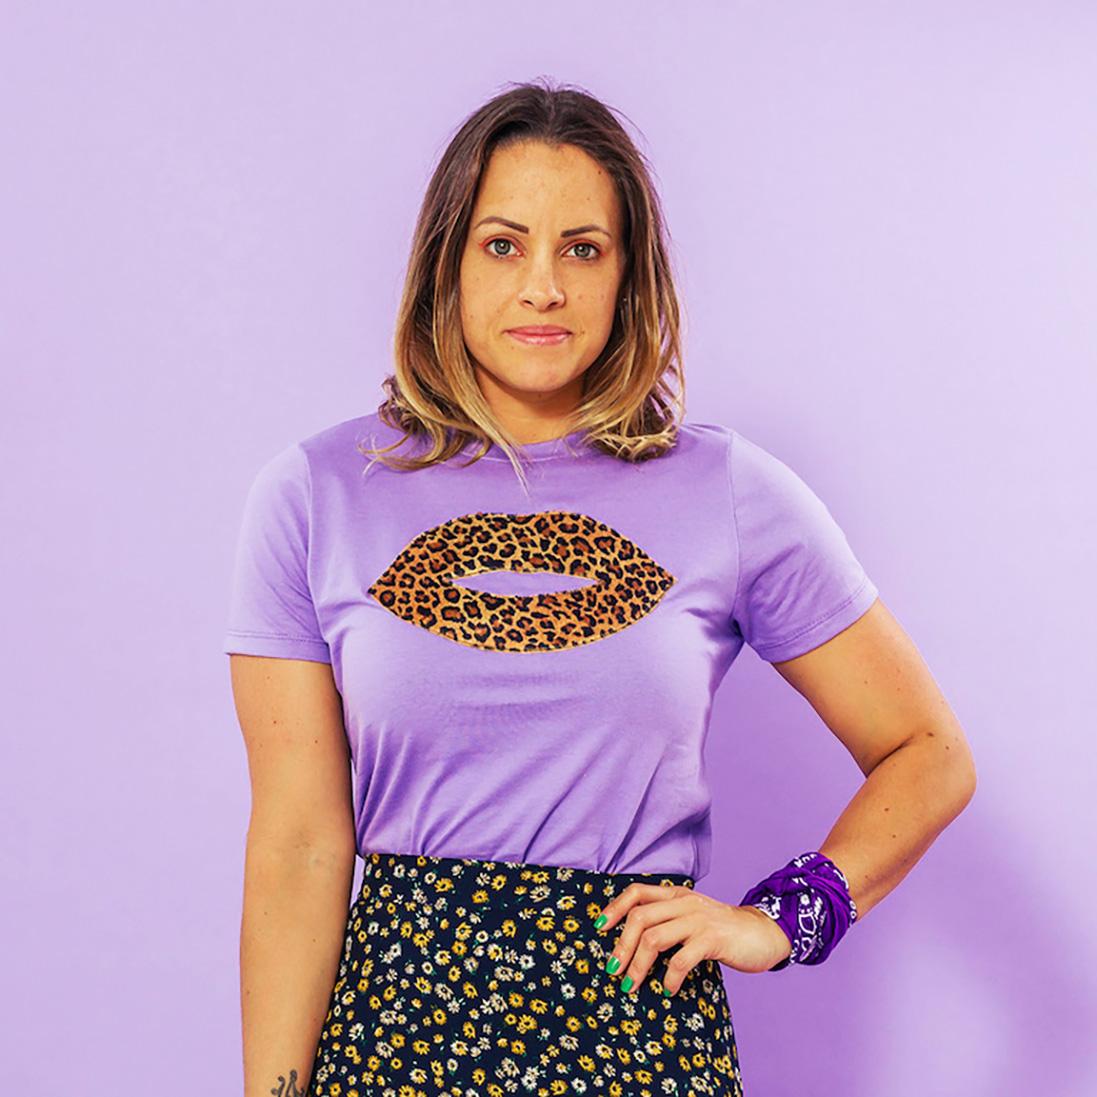 Combo 2 Peças - Tshirt Adulta + Tshirt Infantil Boca Onça Roxo